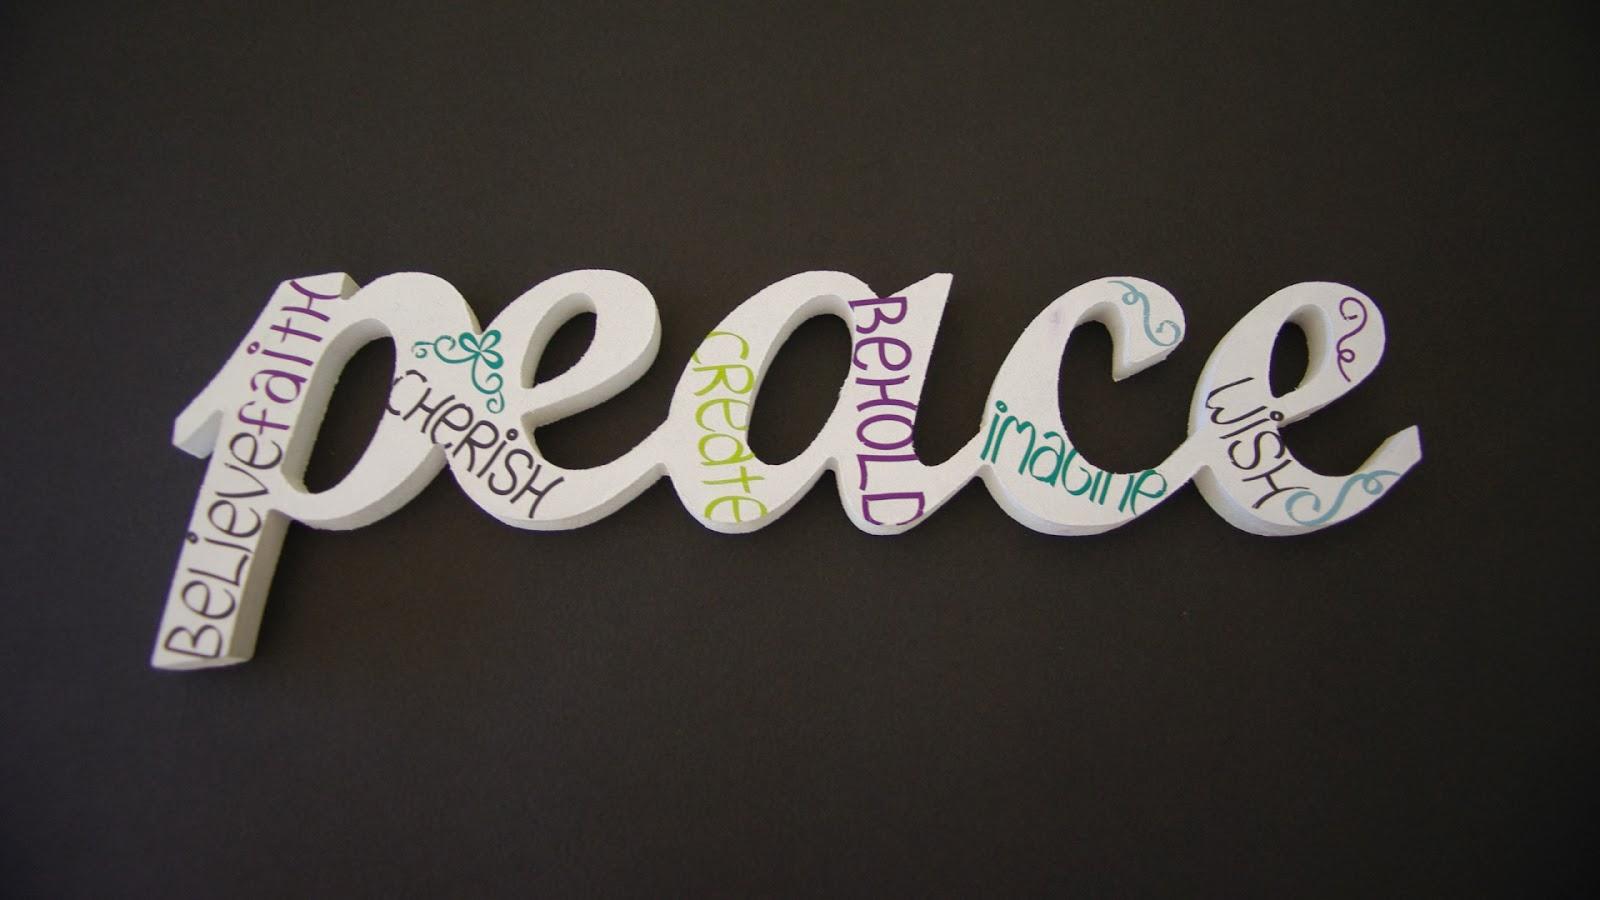 Peace Wallpaper Full HD Desktop Wallpapers 1080p 1600x900